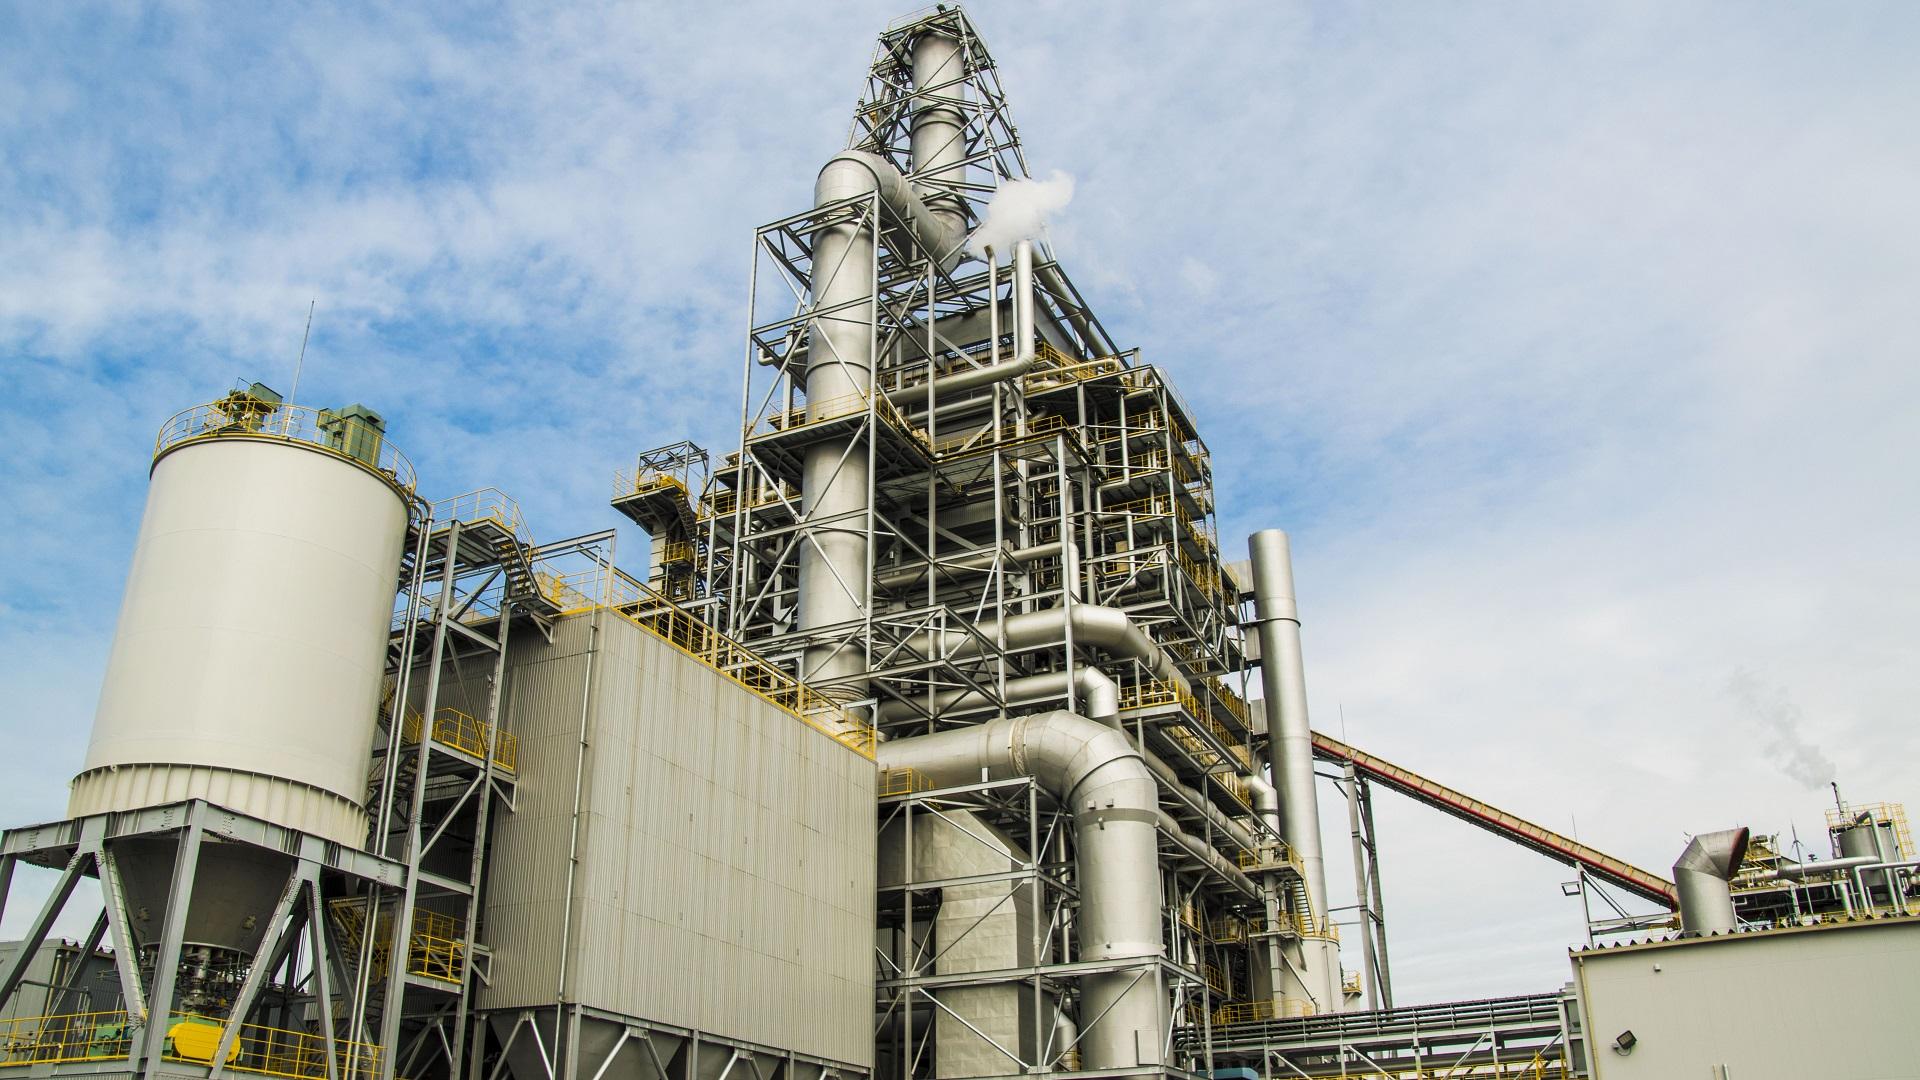 Japan's largest woody biomass power plant operating on Chita